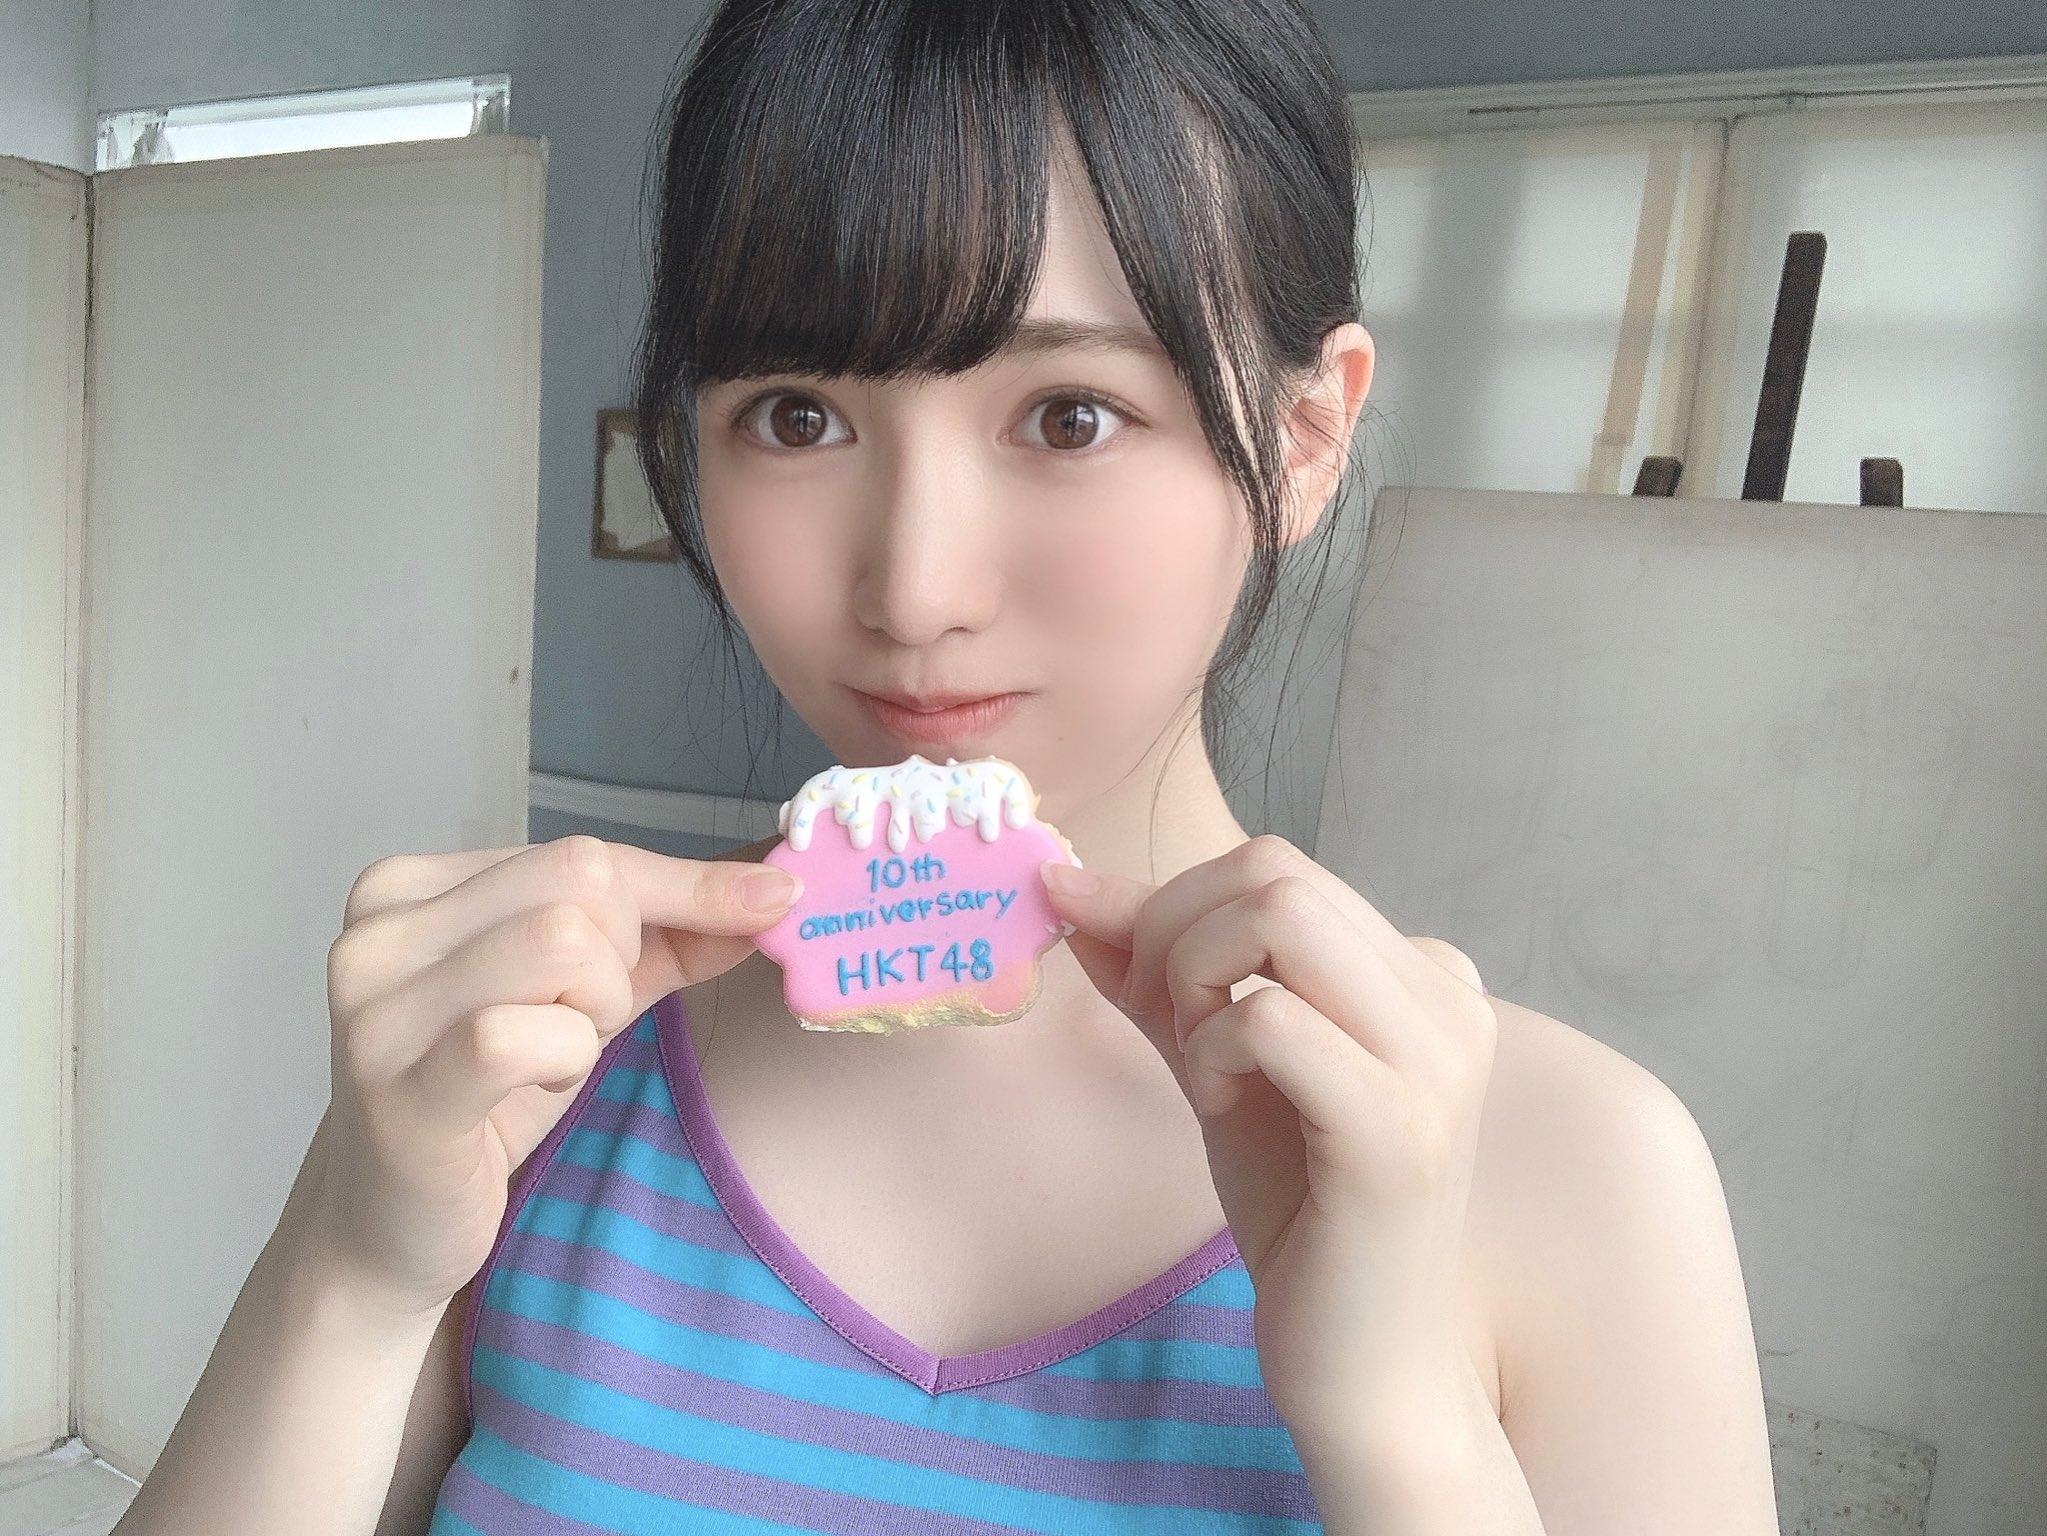 HKT48運上弘菜「美デコルテがセクシー!」『漫画アクション』撮影オフショット披露にファン歓喜【画像2枚】の画像002